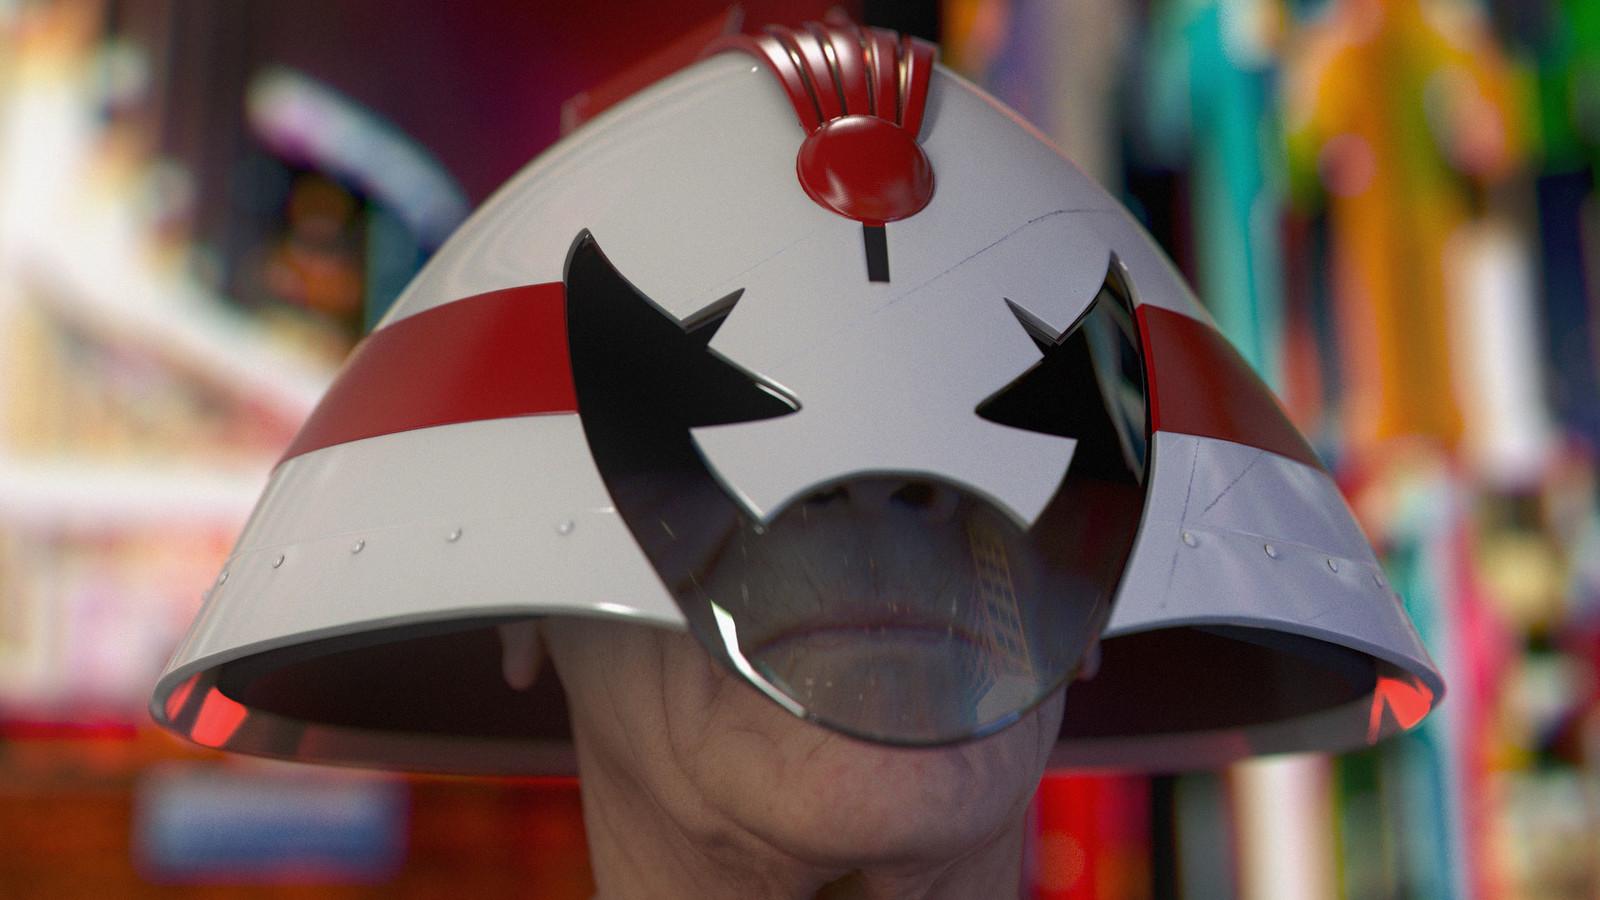 Hondo-Cit Judge Helmet based on a design by Brendan McCarthy (Head sculpt by Ten24)